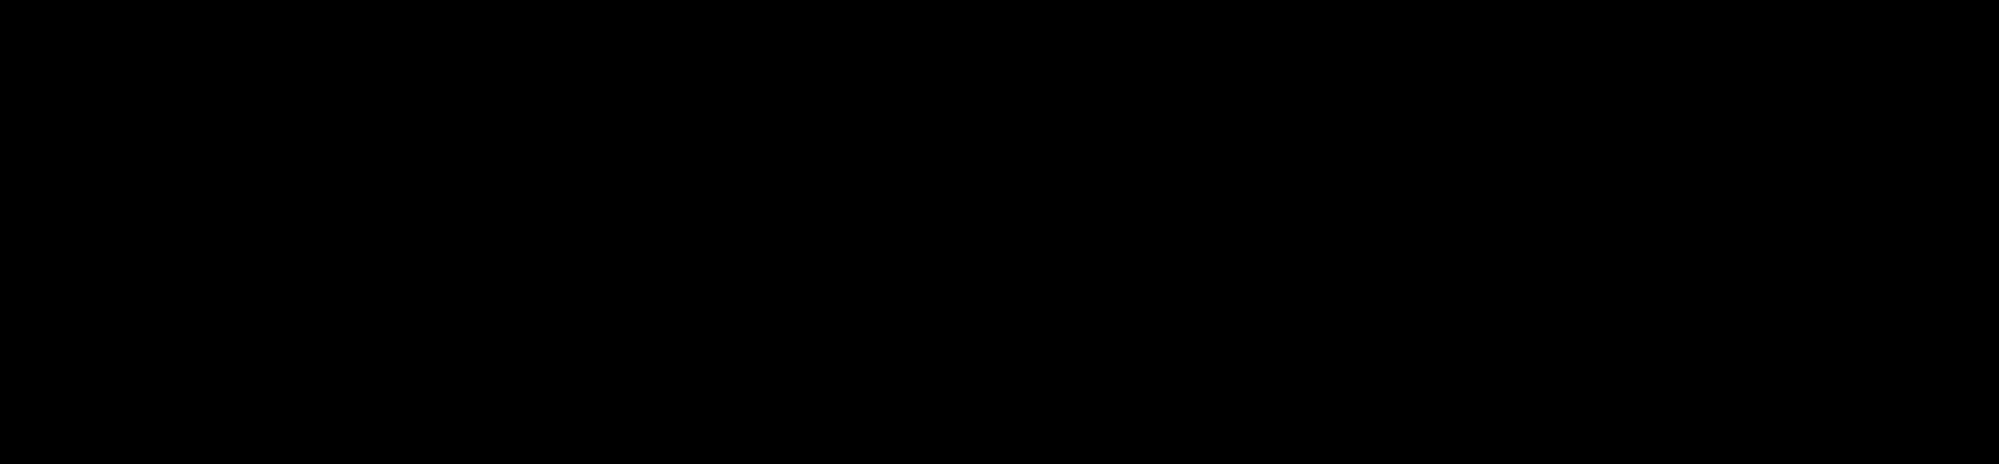 image163.png